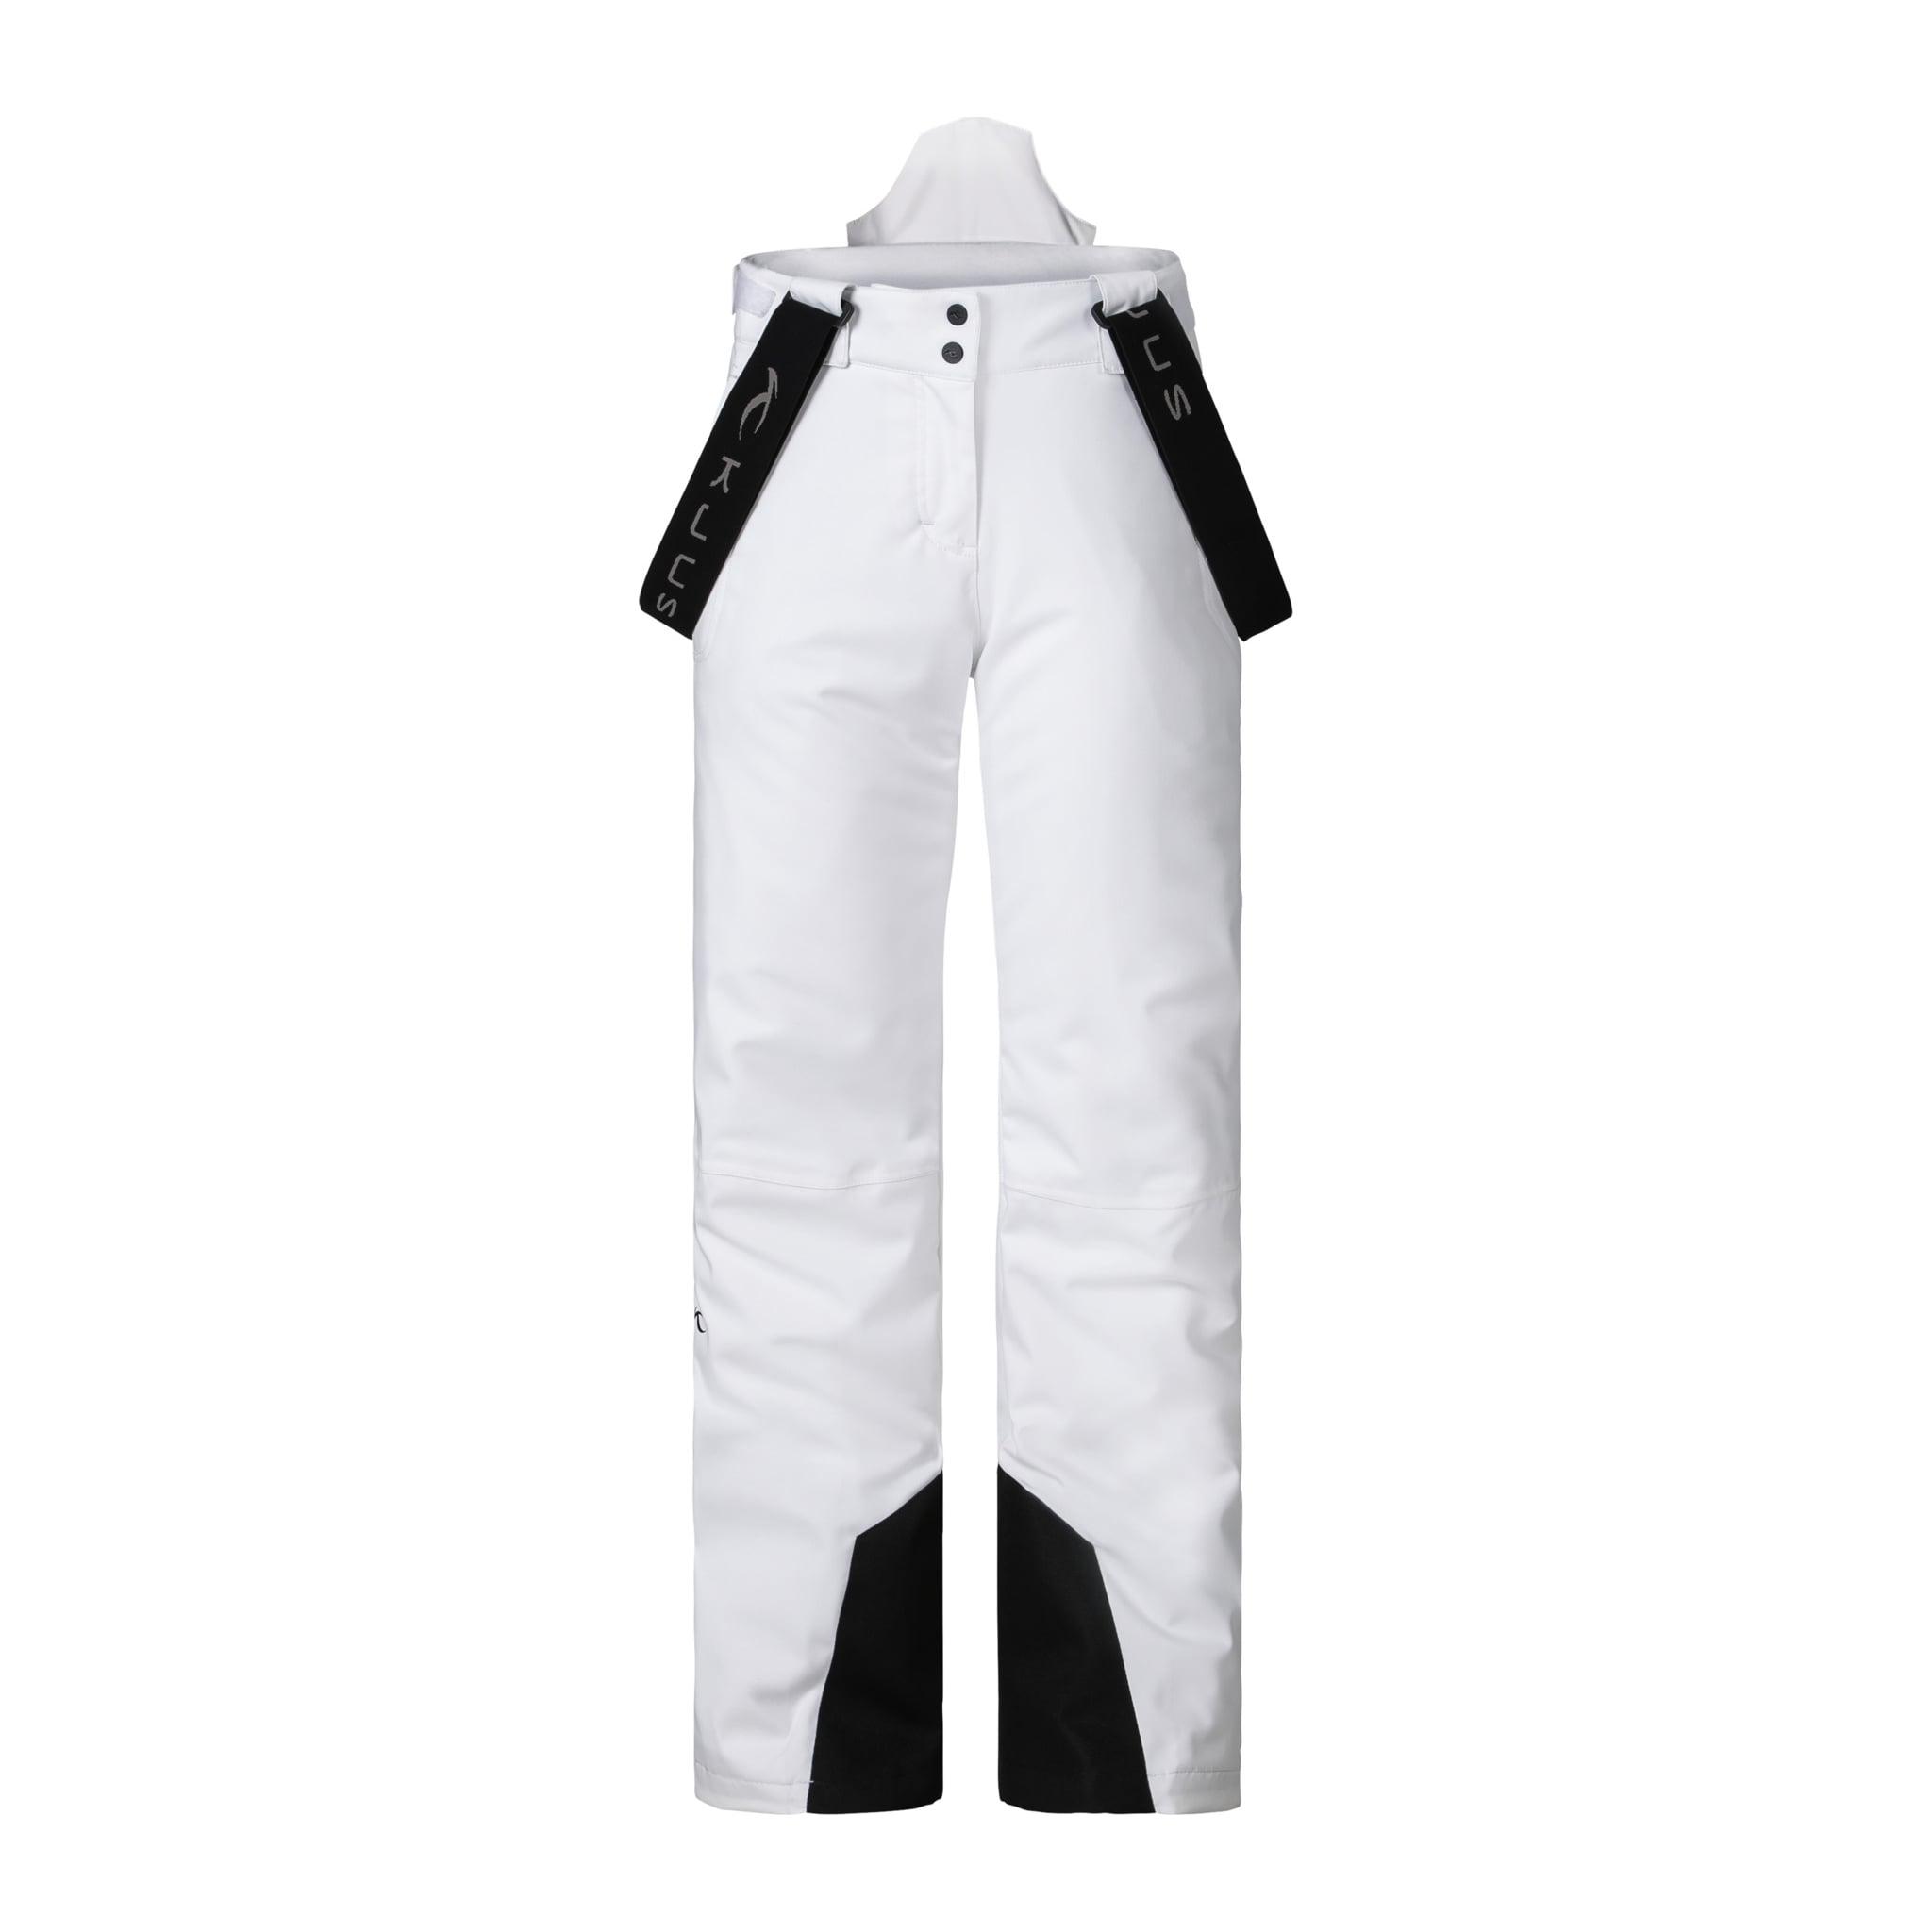 Komfortable bukser laget for ukomfortable værforhold